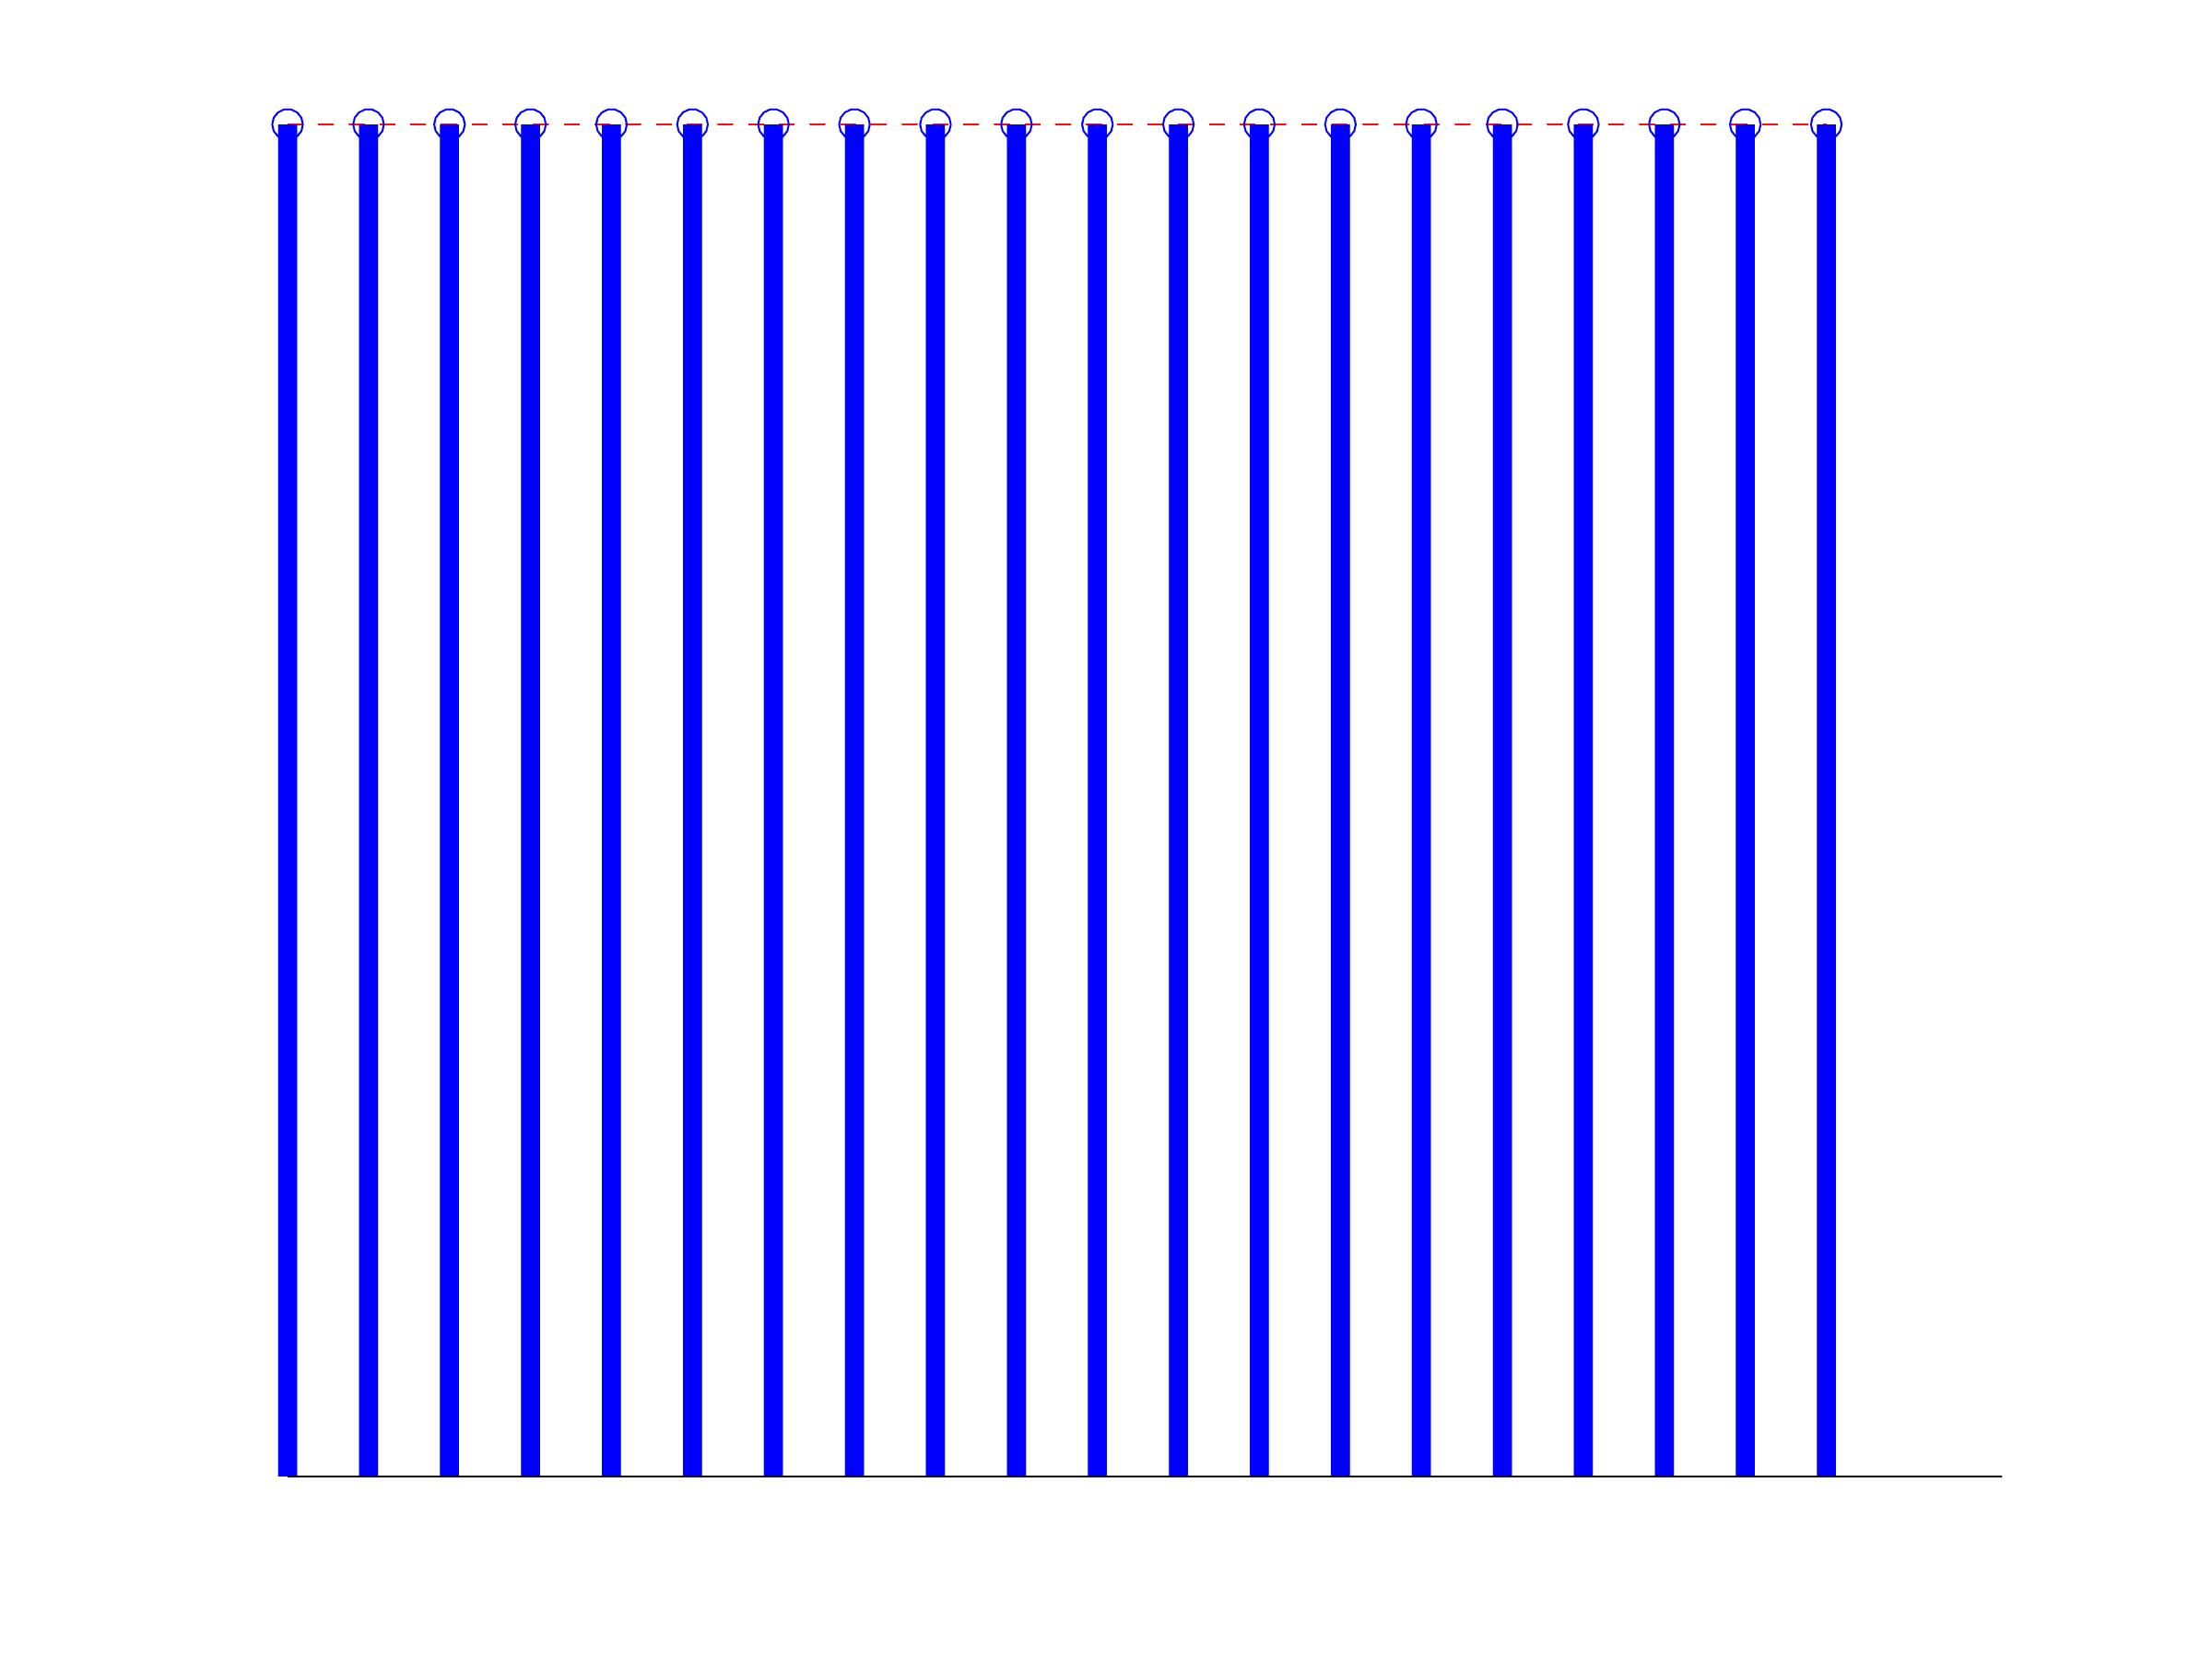 visual representation of direct current